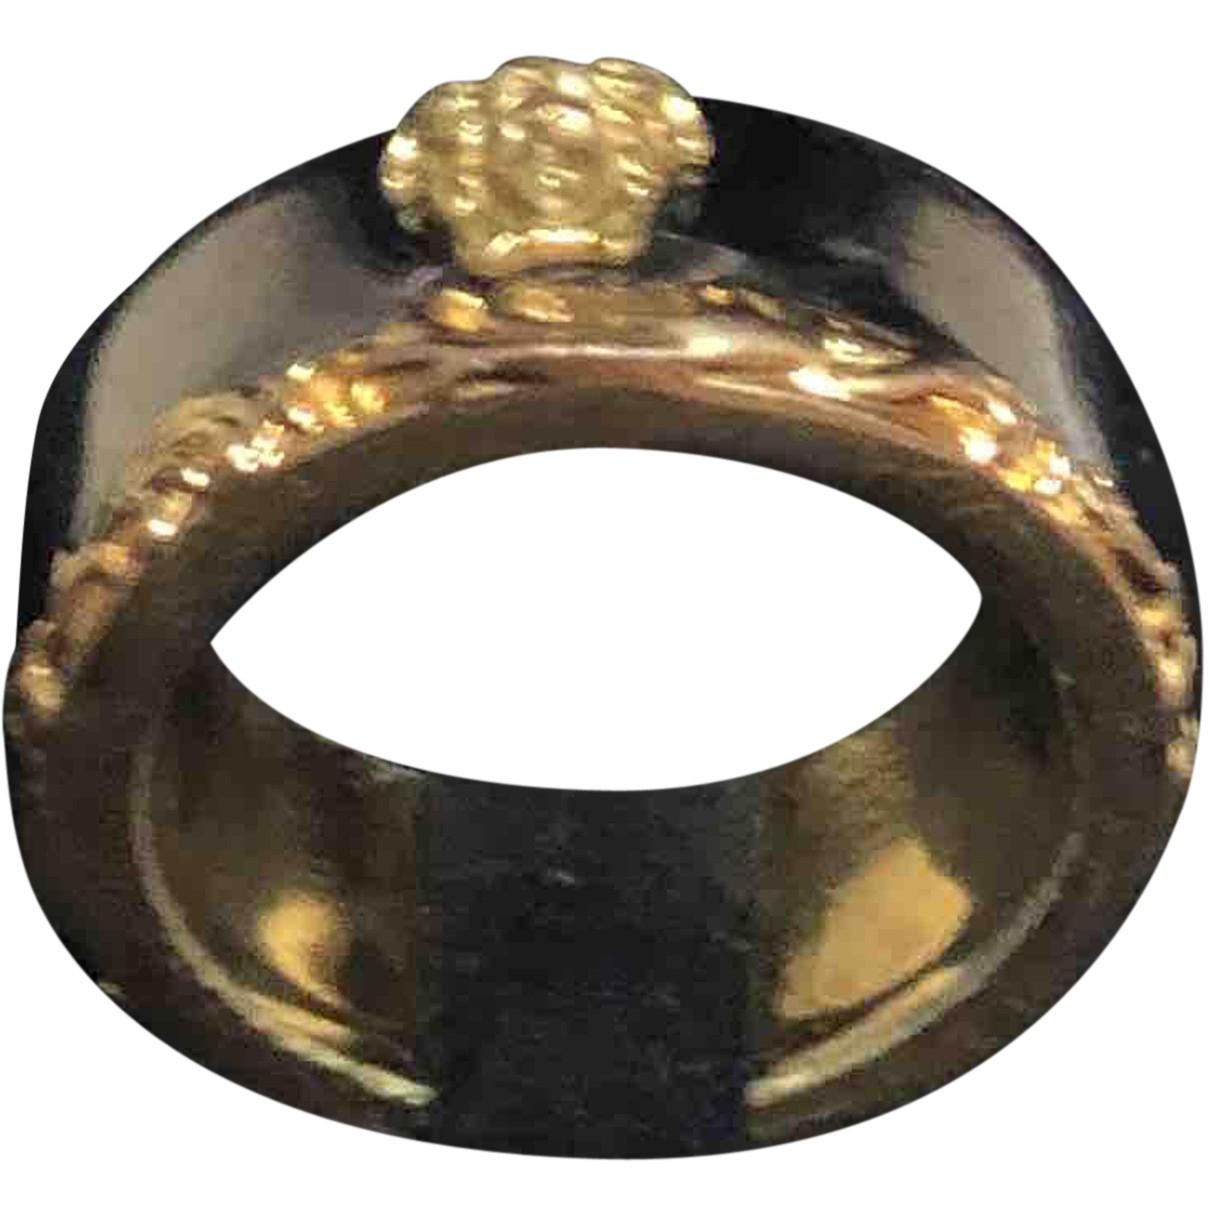 Versace Medusa Schmuckstuecke in  Gold Stahl